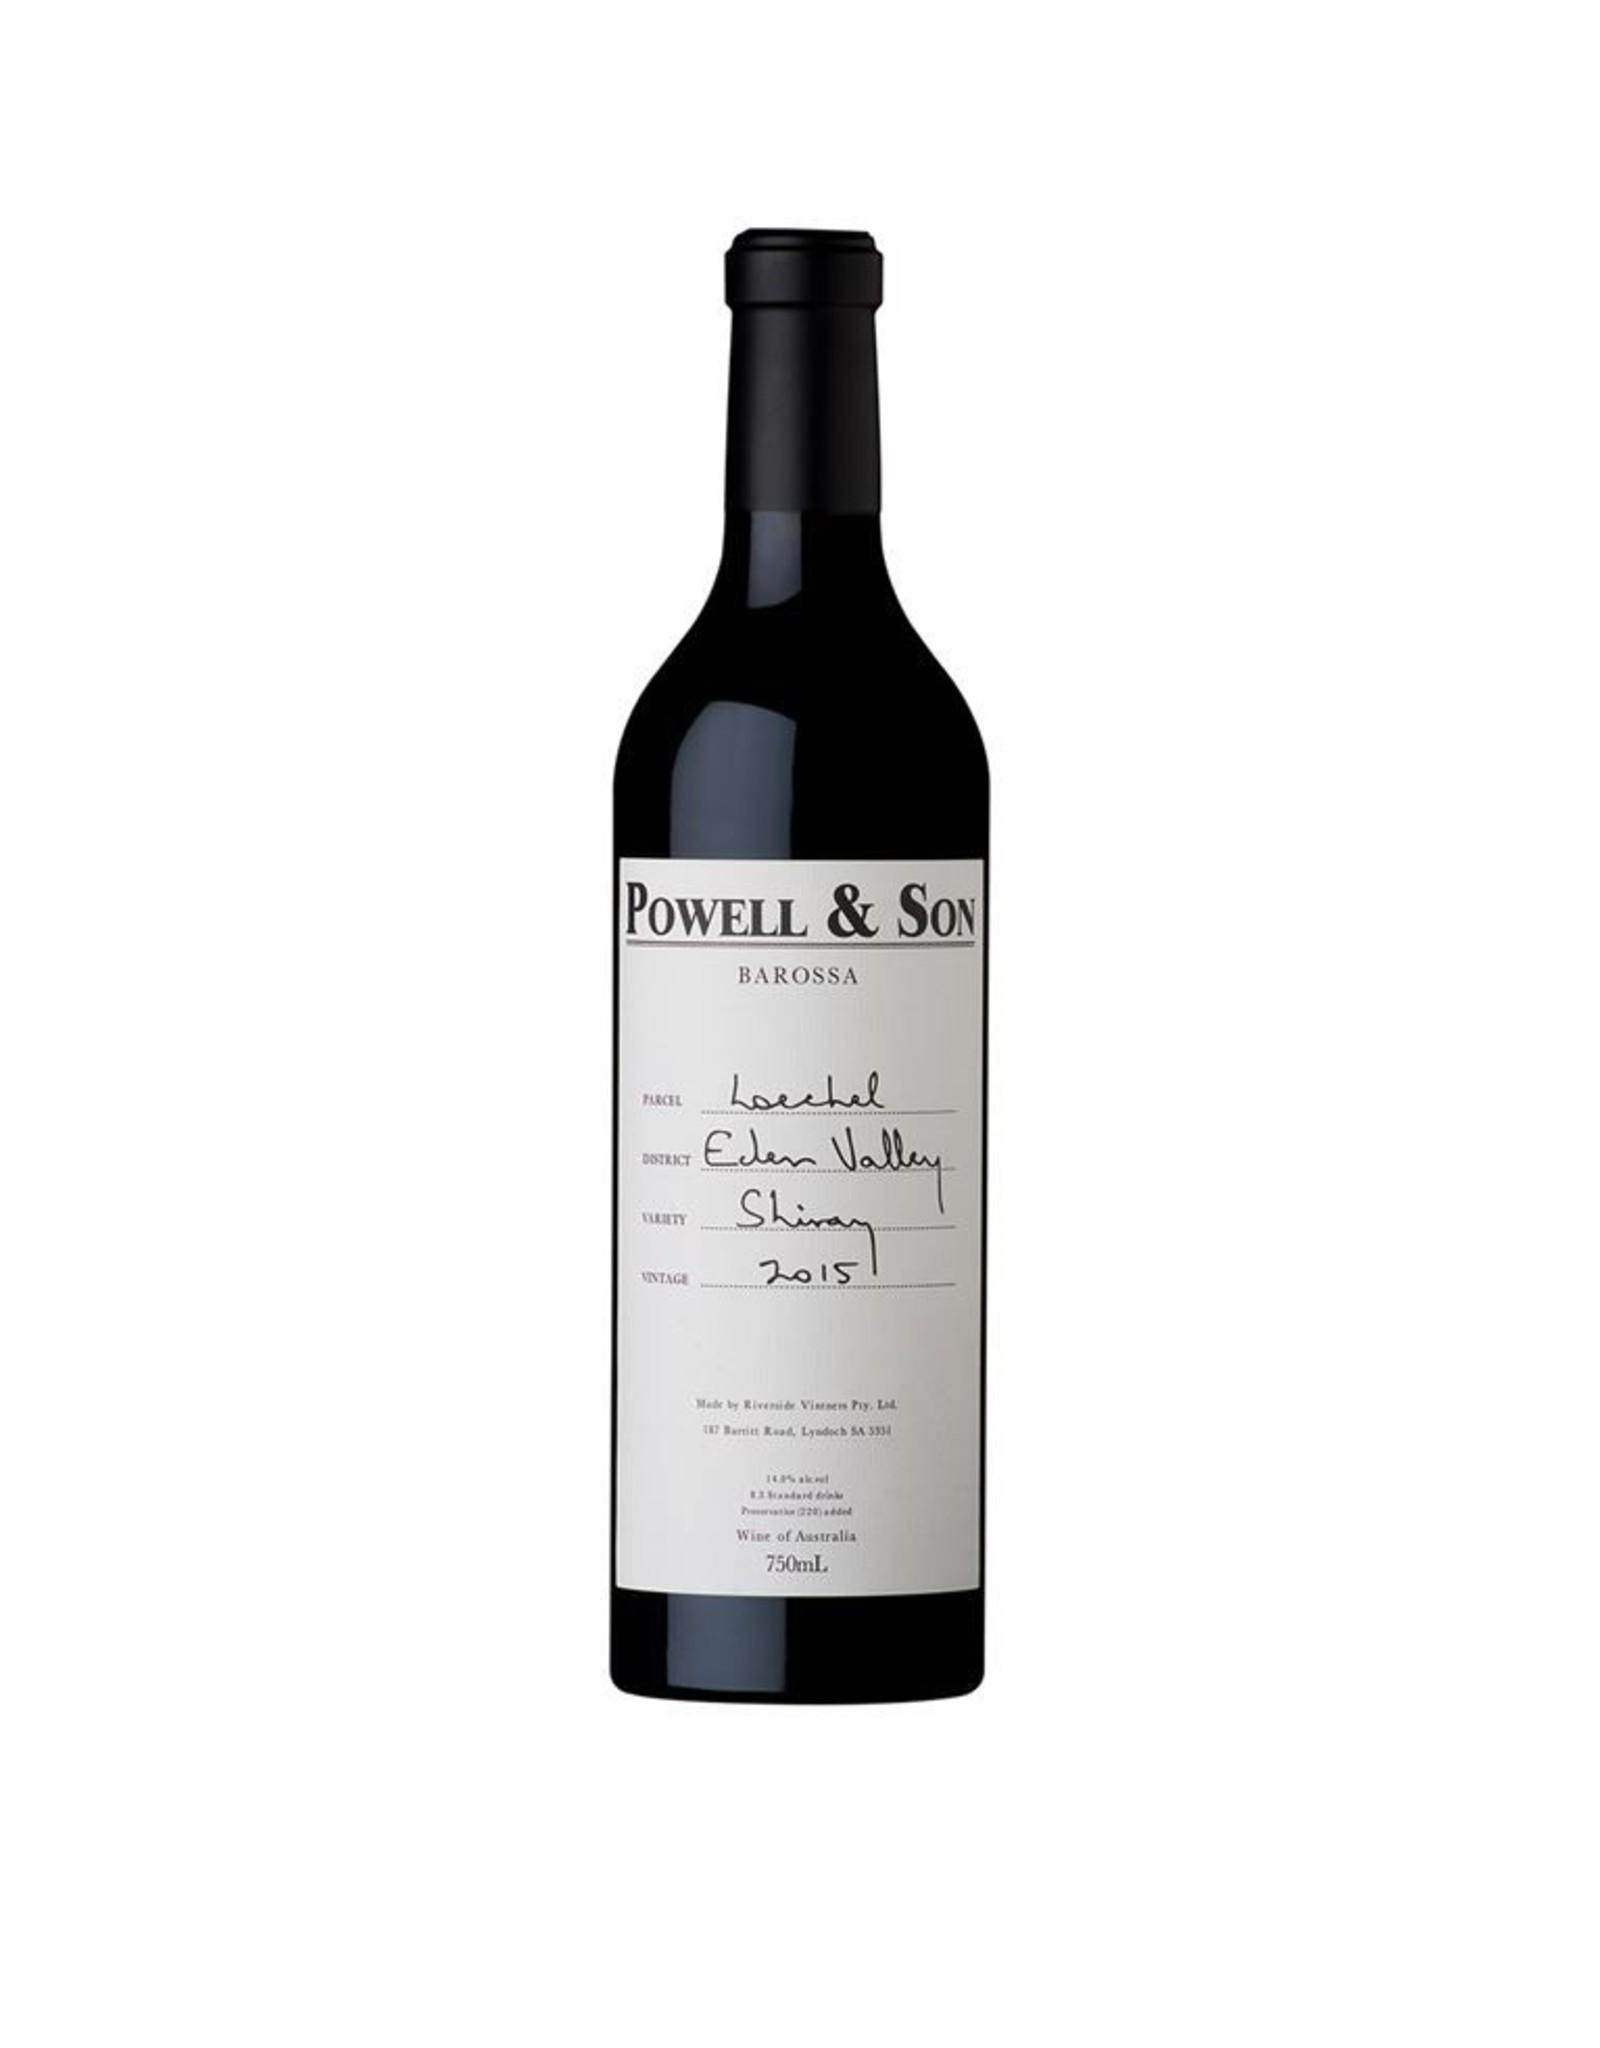 Red Wine 2015, Powell & Son Loechel, Shiraz, Eden Valley, Barossa, Australia, 14.5% Alc, CT97, RP97